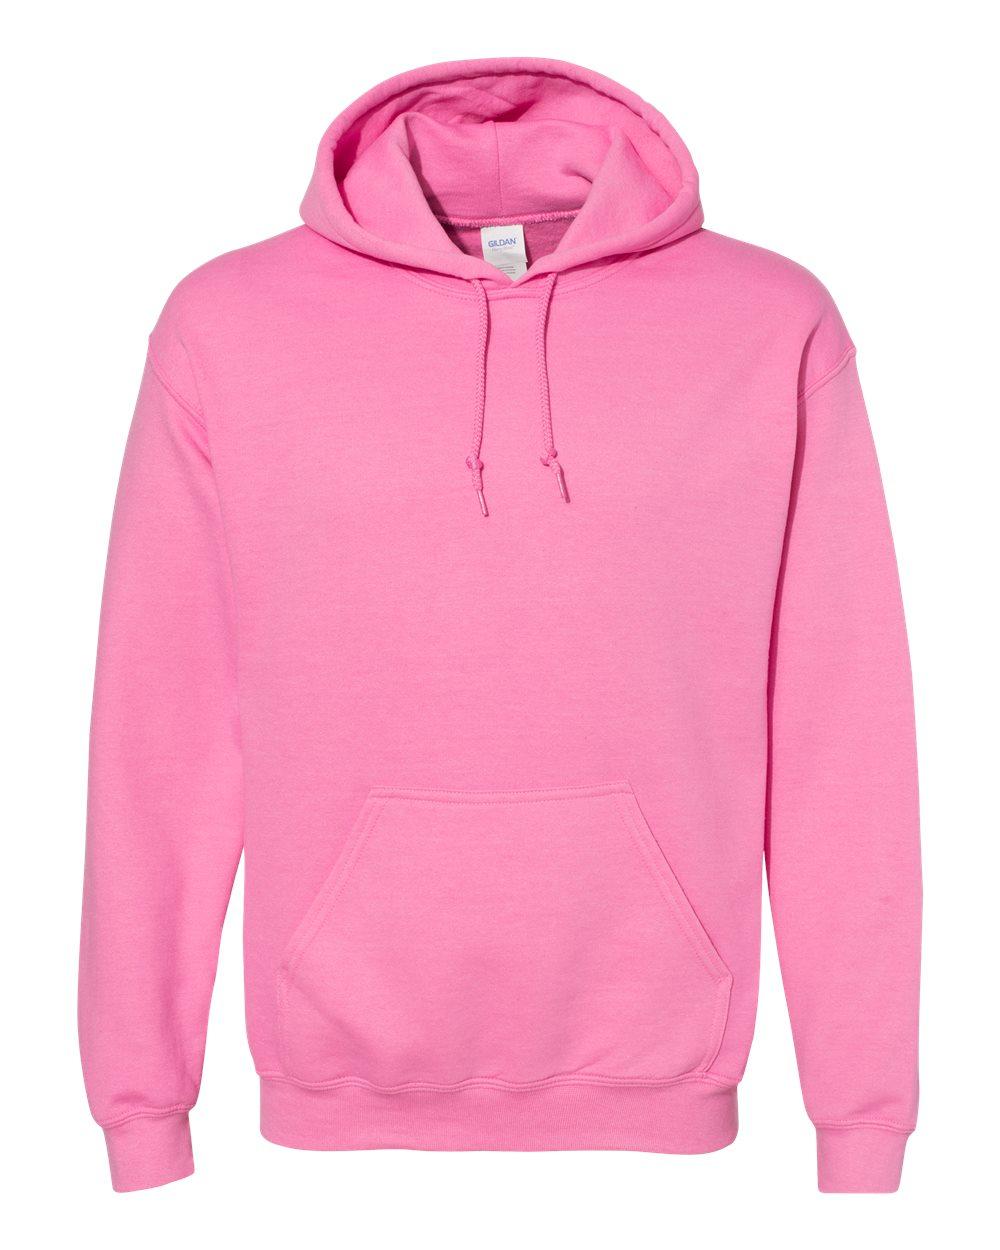 Gildan-Mens-Blank-Hoodie-Heavy-Blend-Hooded-Sweatshirt-Solid-18500-up-to-5XL thumbnail 6